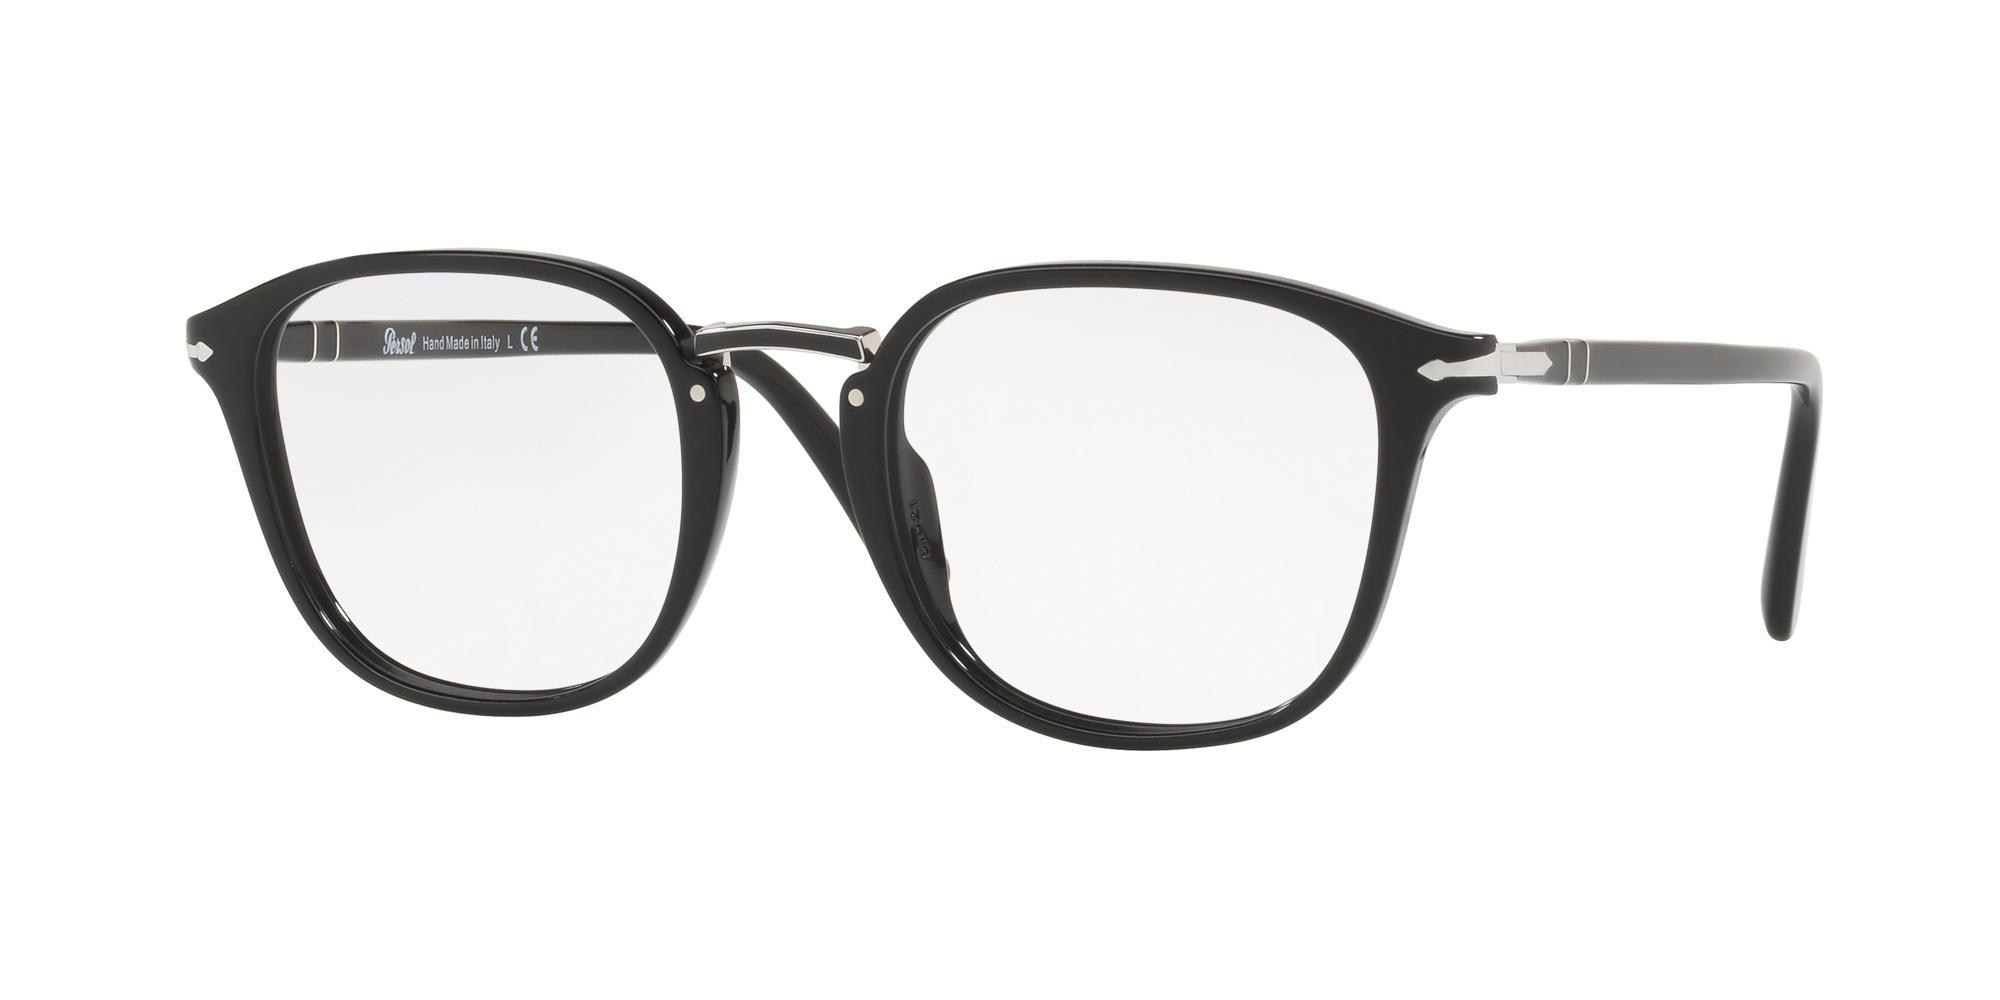 Persol eyeglasses SARTORIA PO 3187V